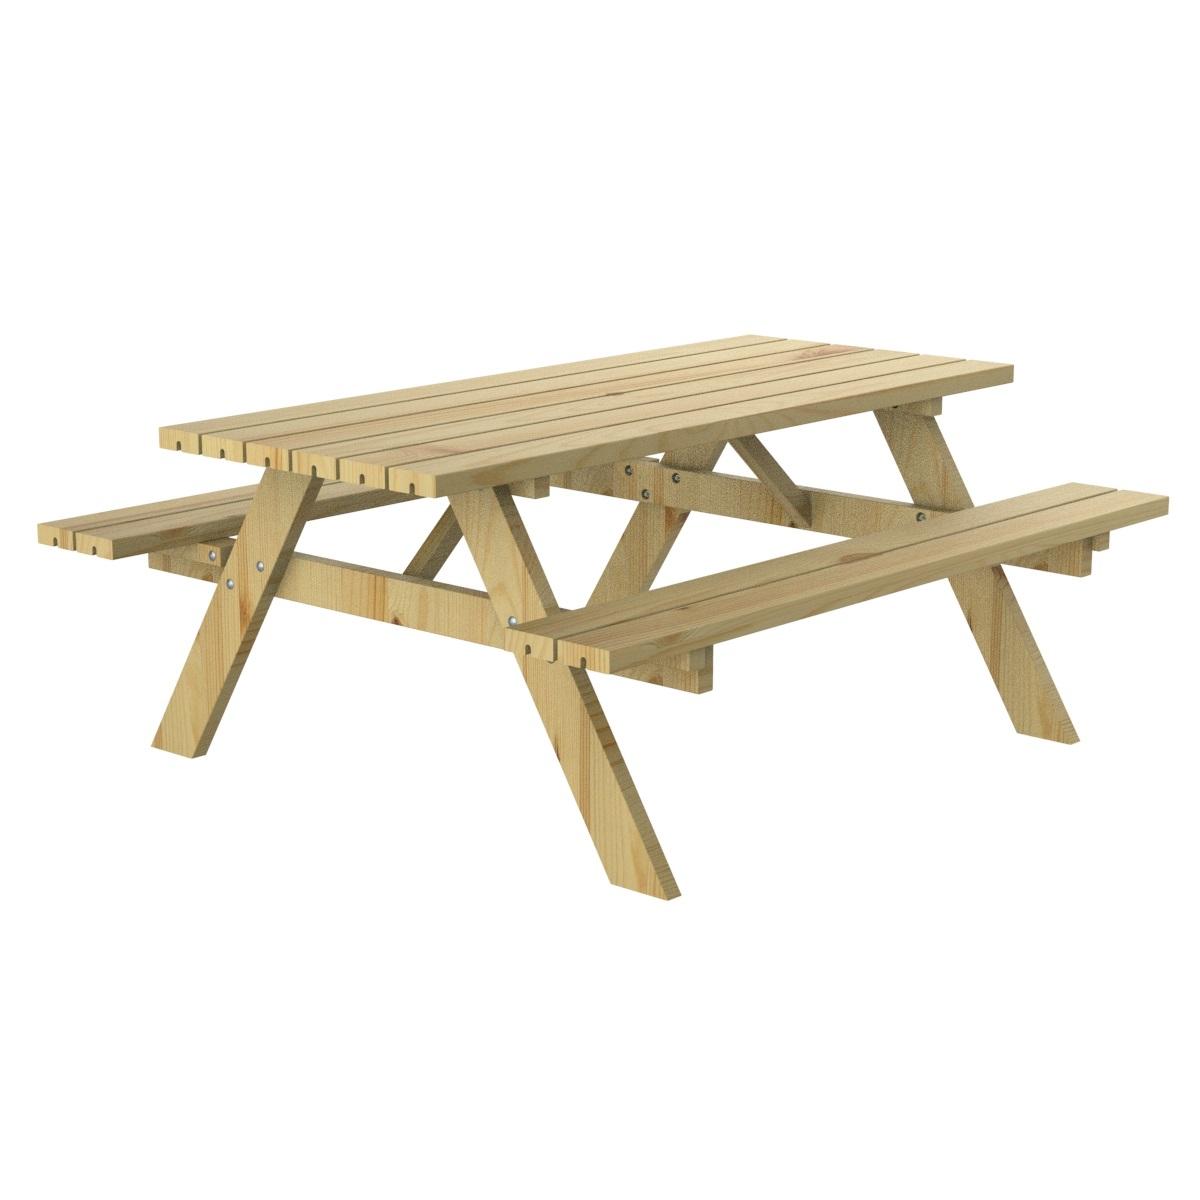 Mesa picnic madera pino mobiliario urbano parques y jardines - Madera de pino tratada ...